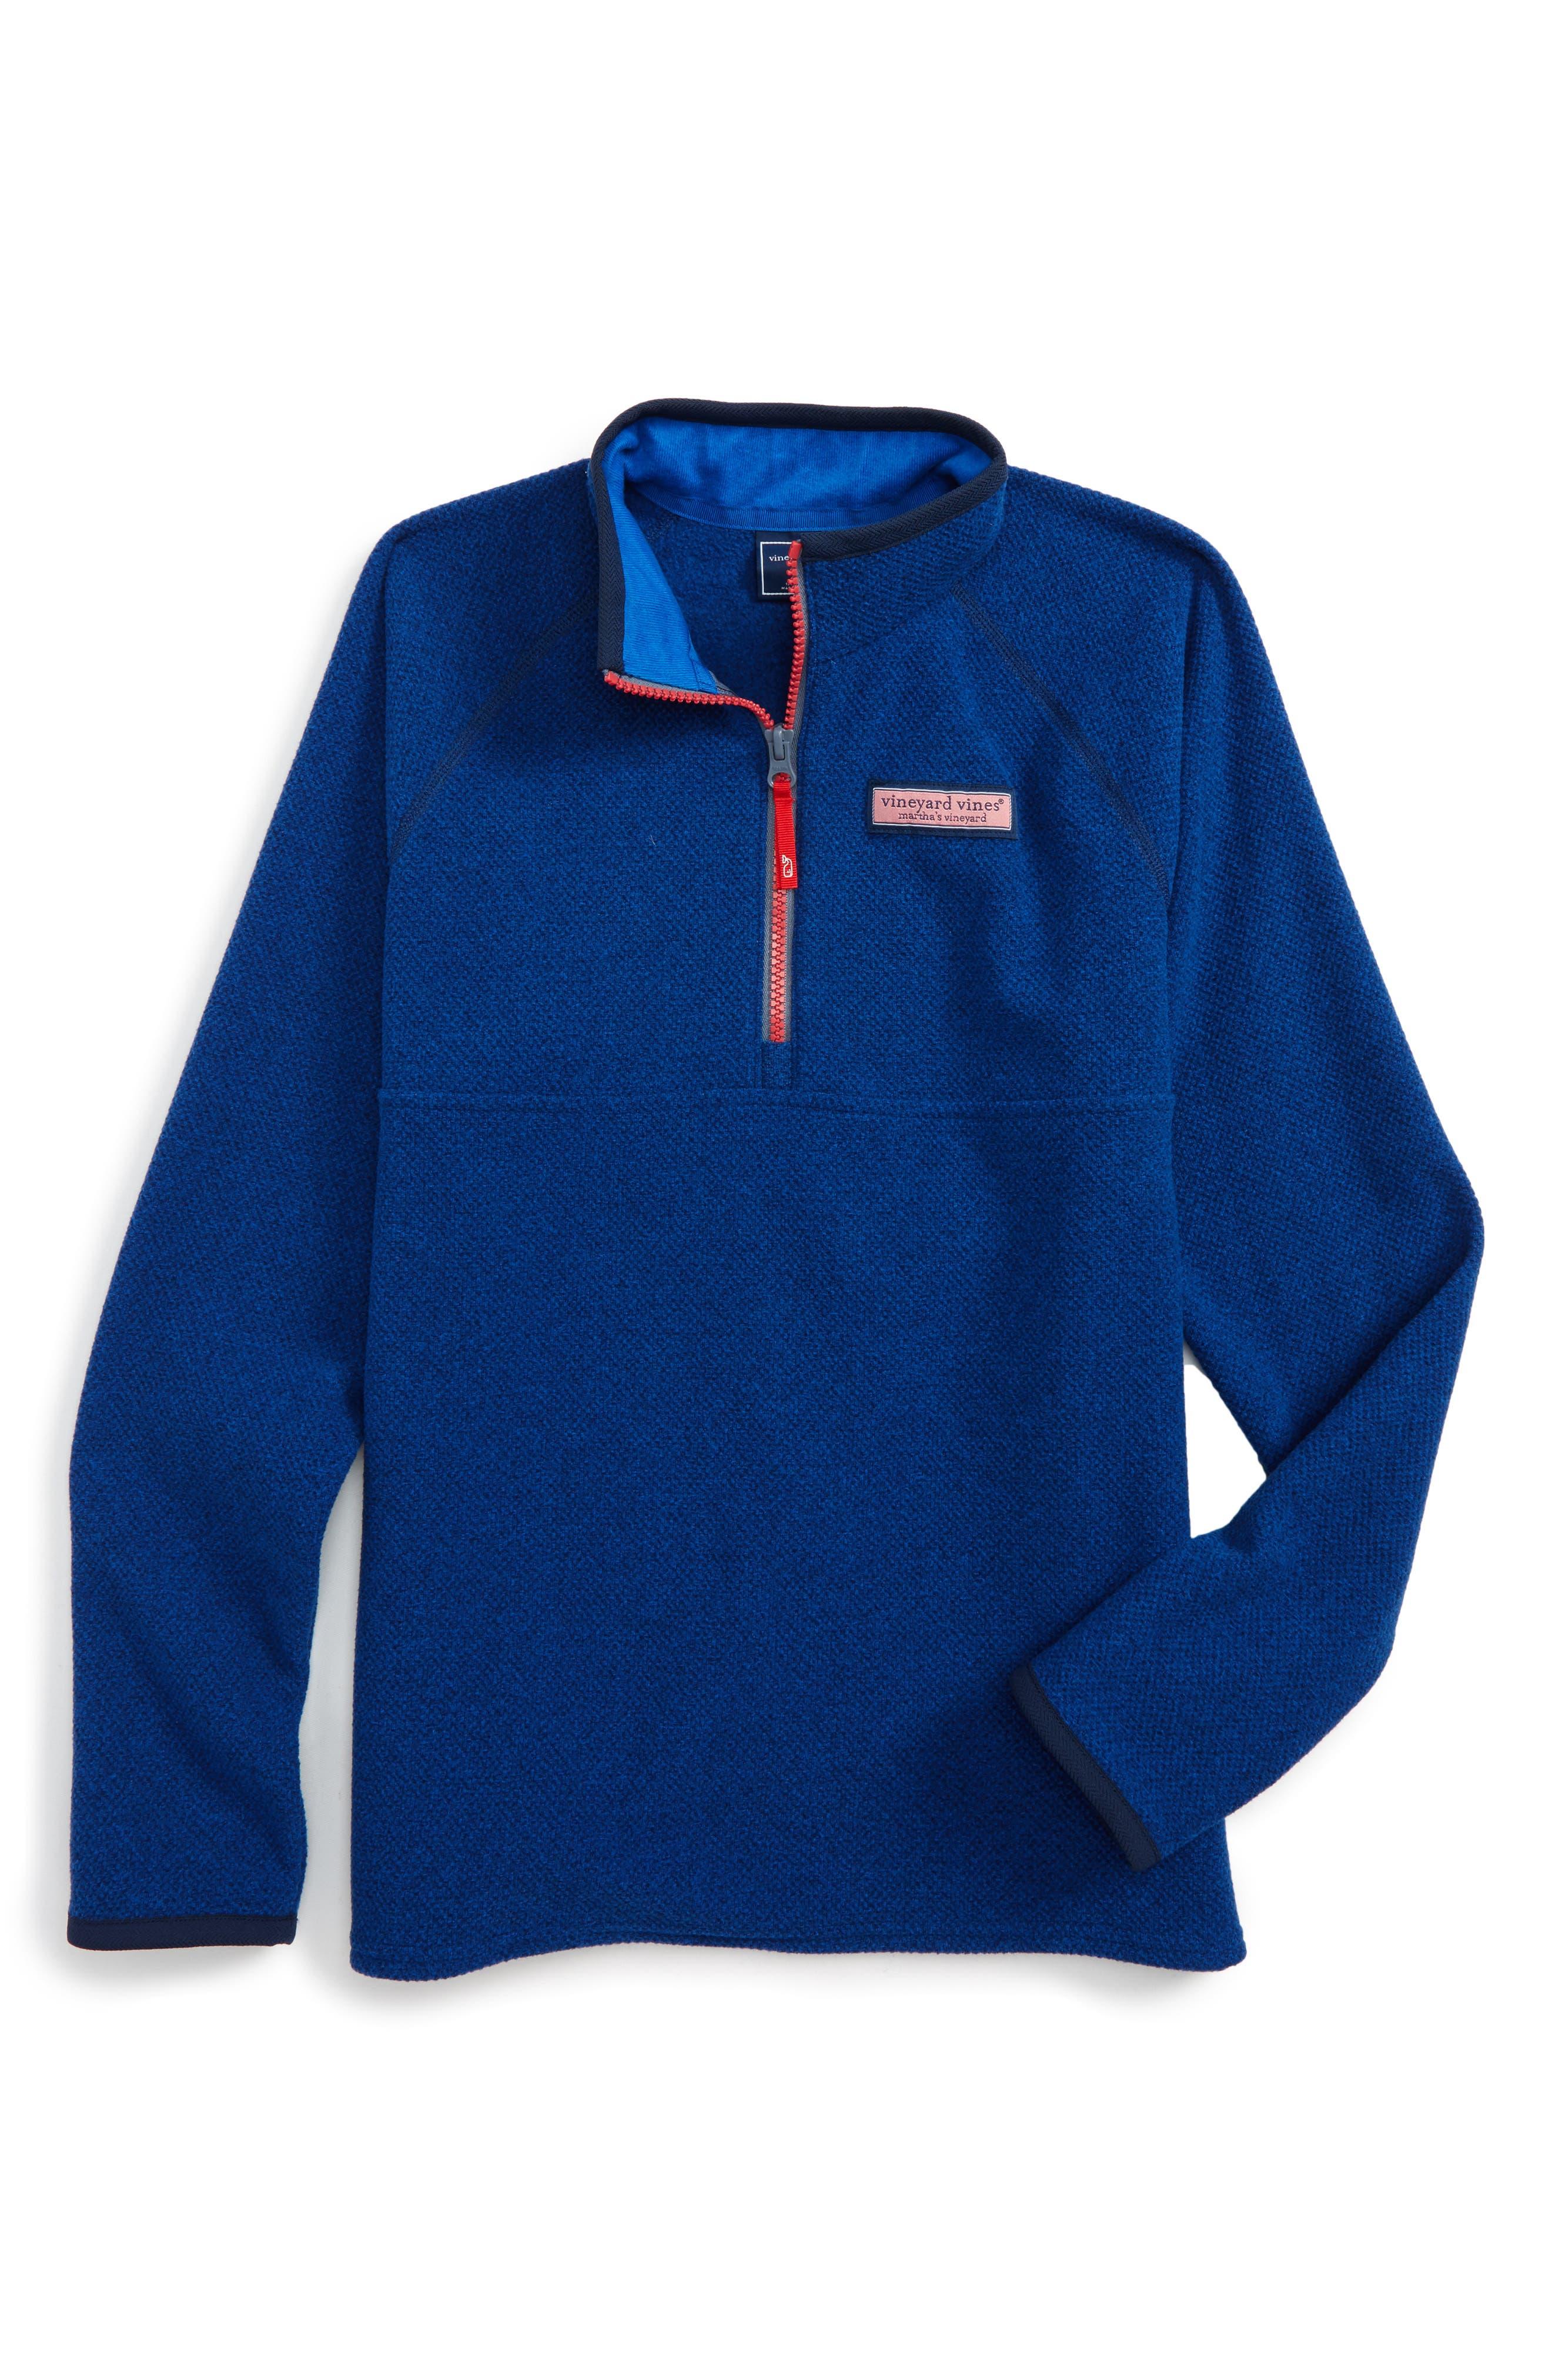 Quarter Zip Sweater,                             Main thumbnail 1, color,                             406